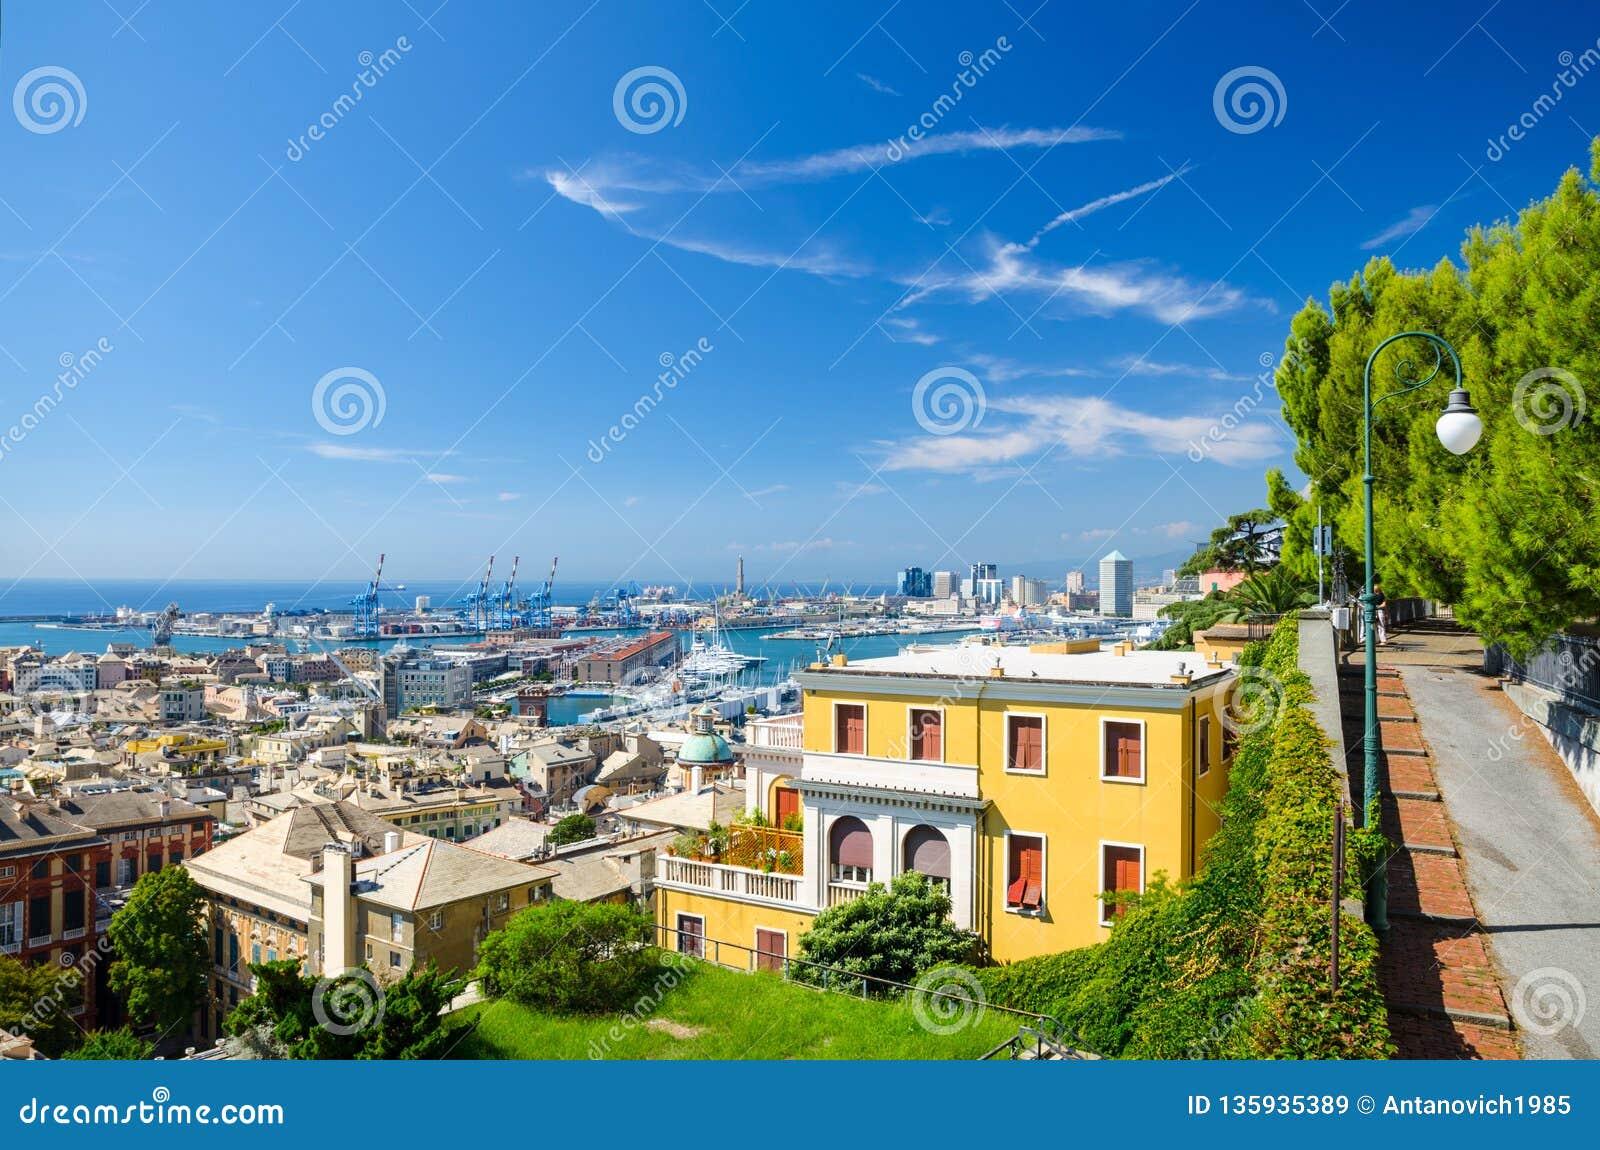 Top aerial scenic panoramic view of european city Genoa